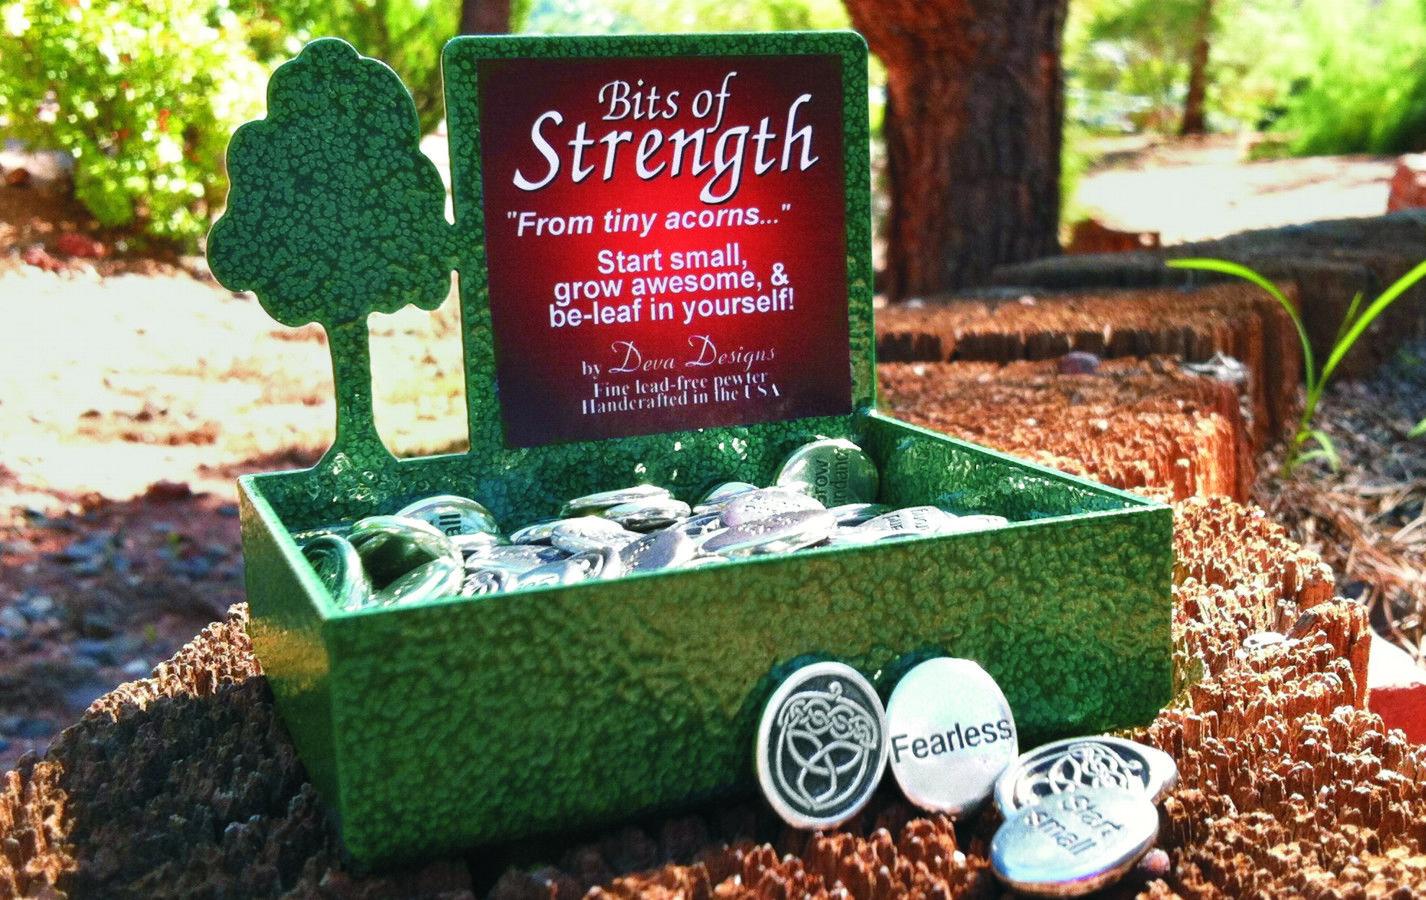 Bits of Strength celtic acorns, by Bob Heiney & Suzie Heiney, submitted by Deva Designs